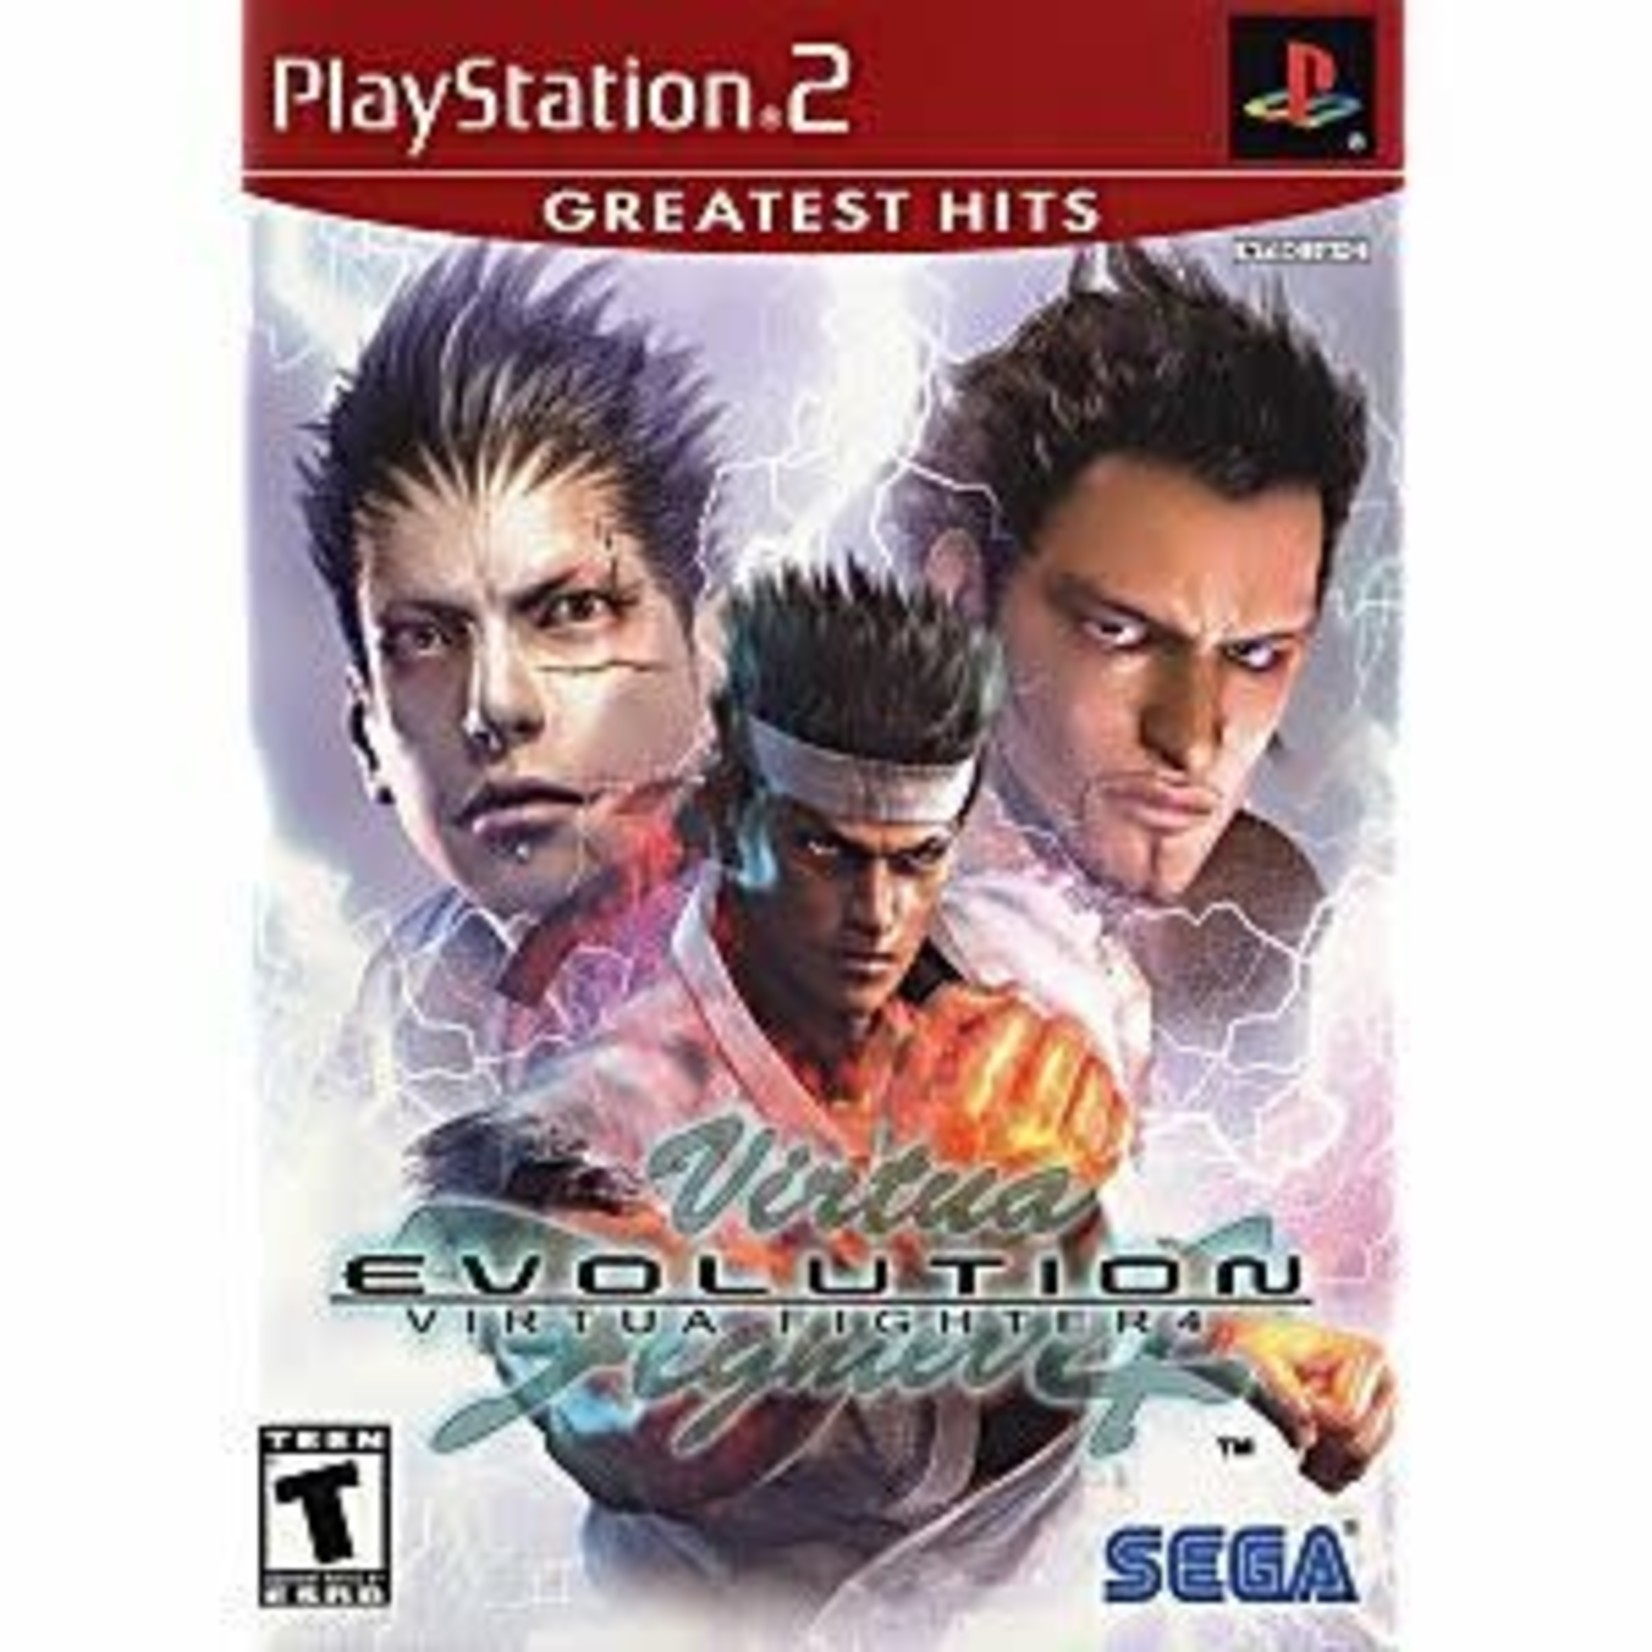 PS2U-VIRTUA FIGHTER 4 EVOLUTION